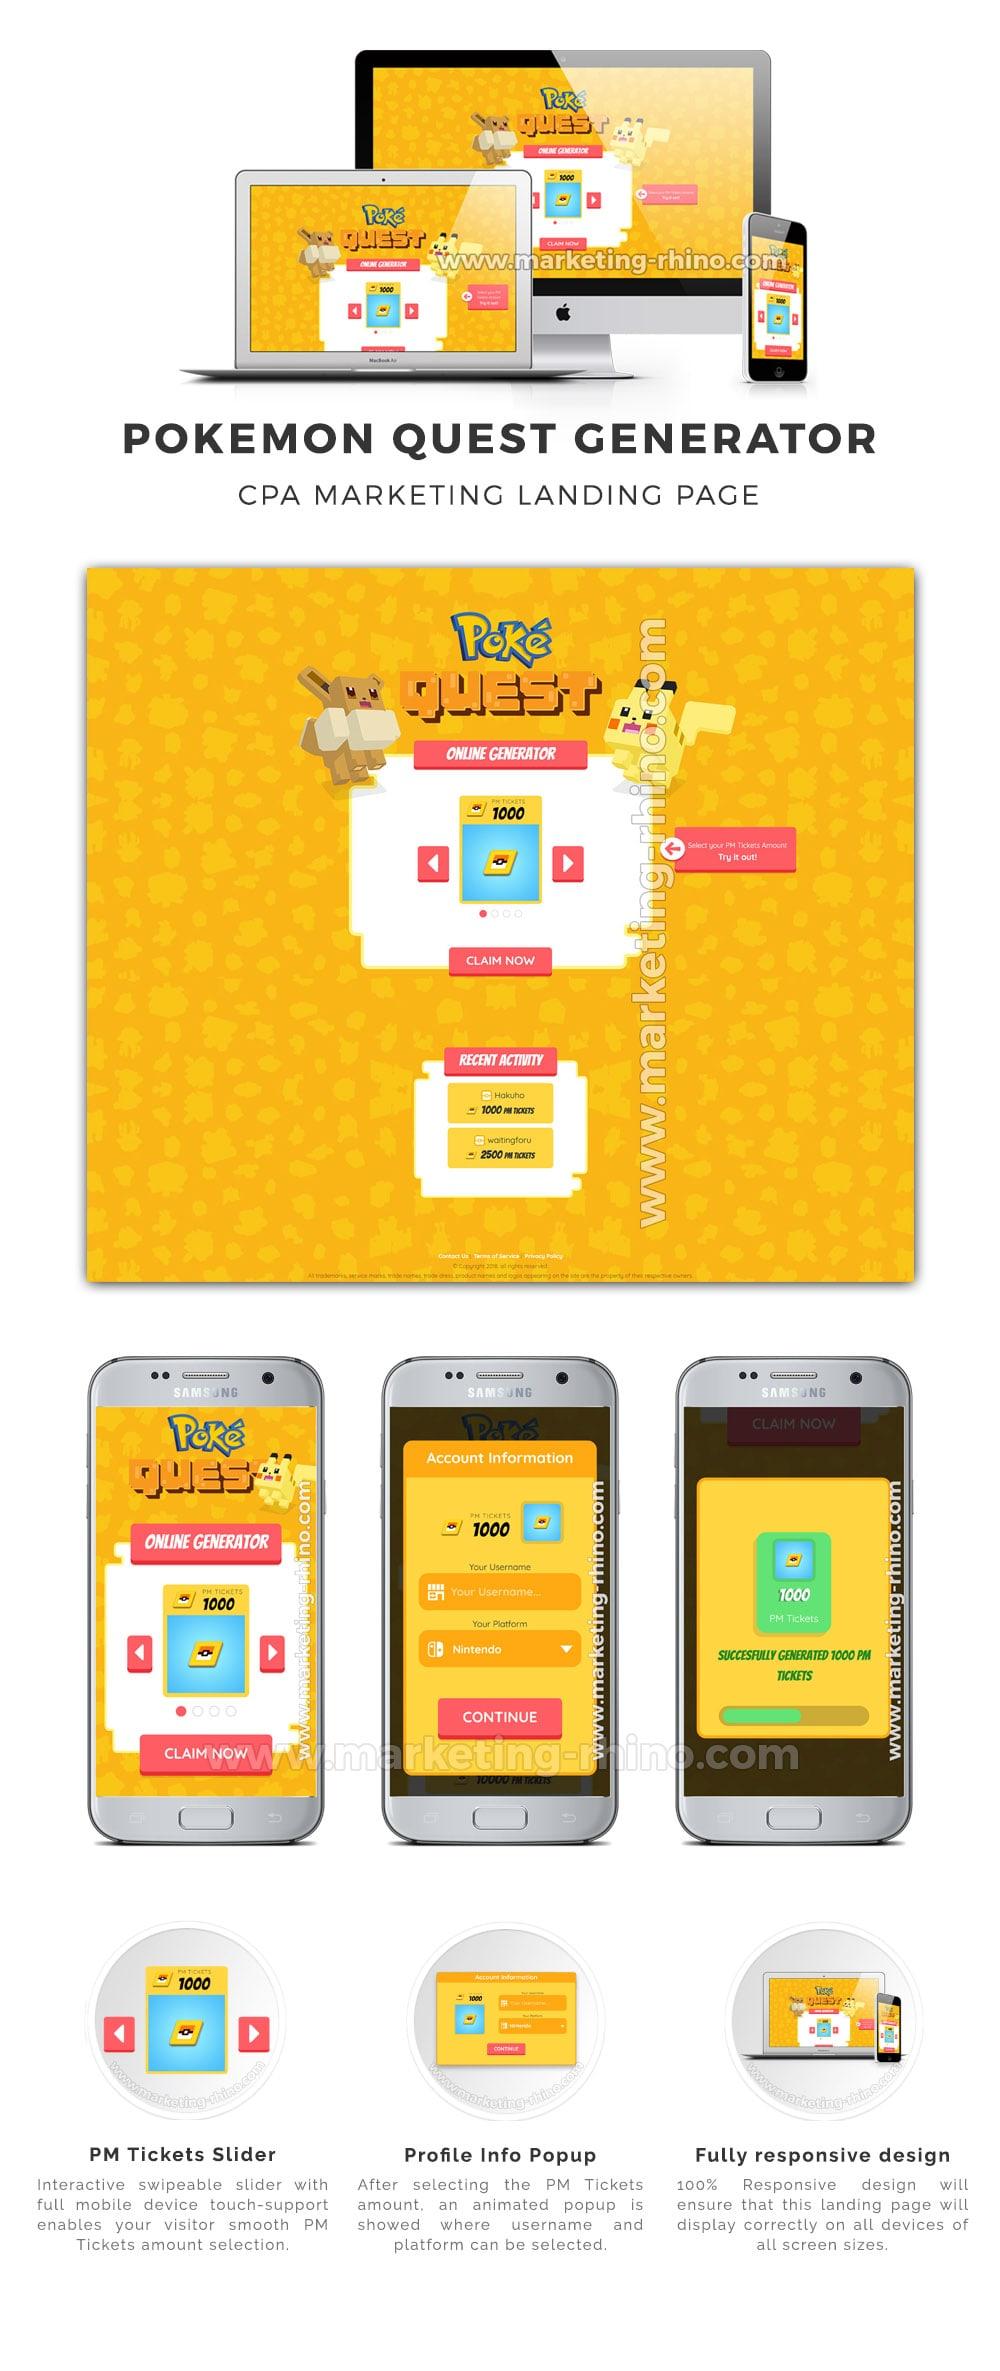 [Image: cpaelites-marketing-rhino-pokemon-quest-...or-min.jpg]